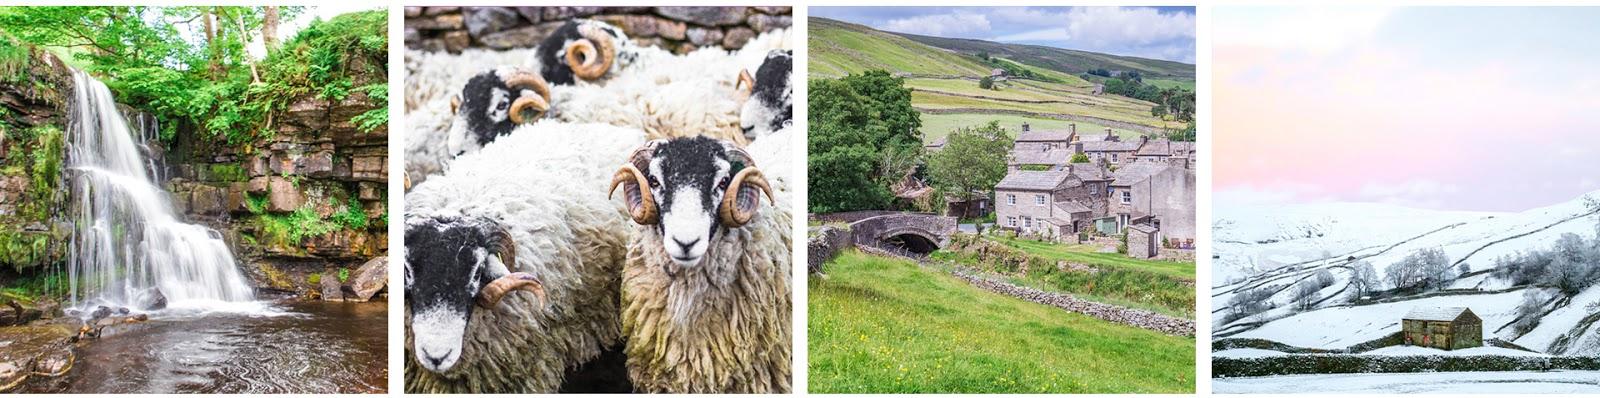 Aygill Farm holiday cottage Swaledale Yorkshire Dales sheep farm